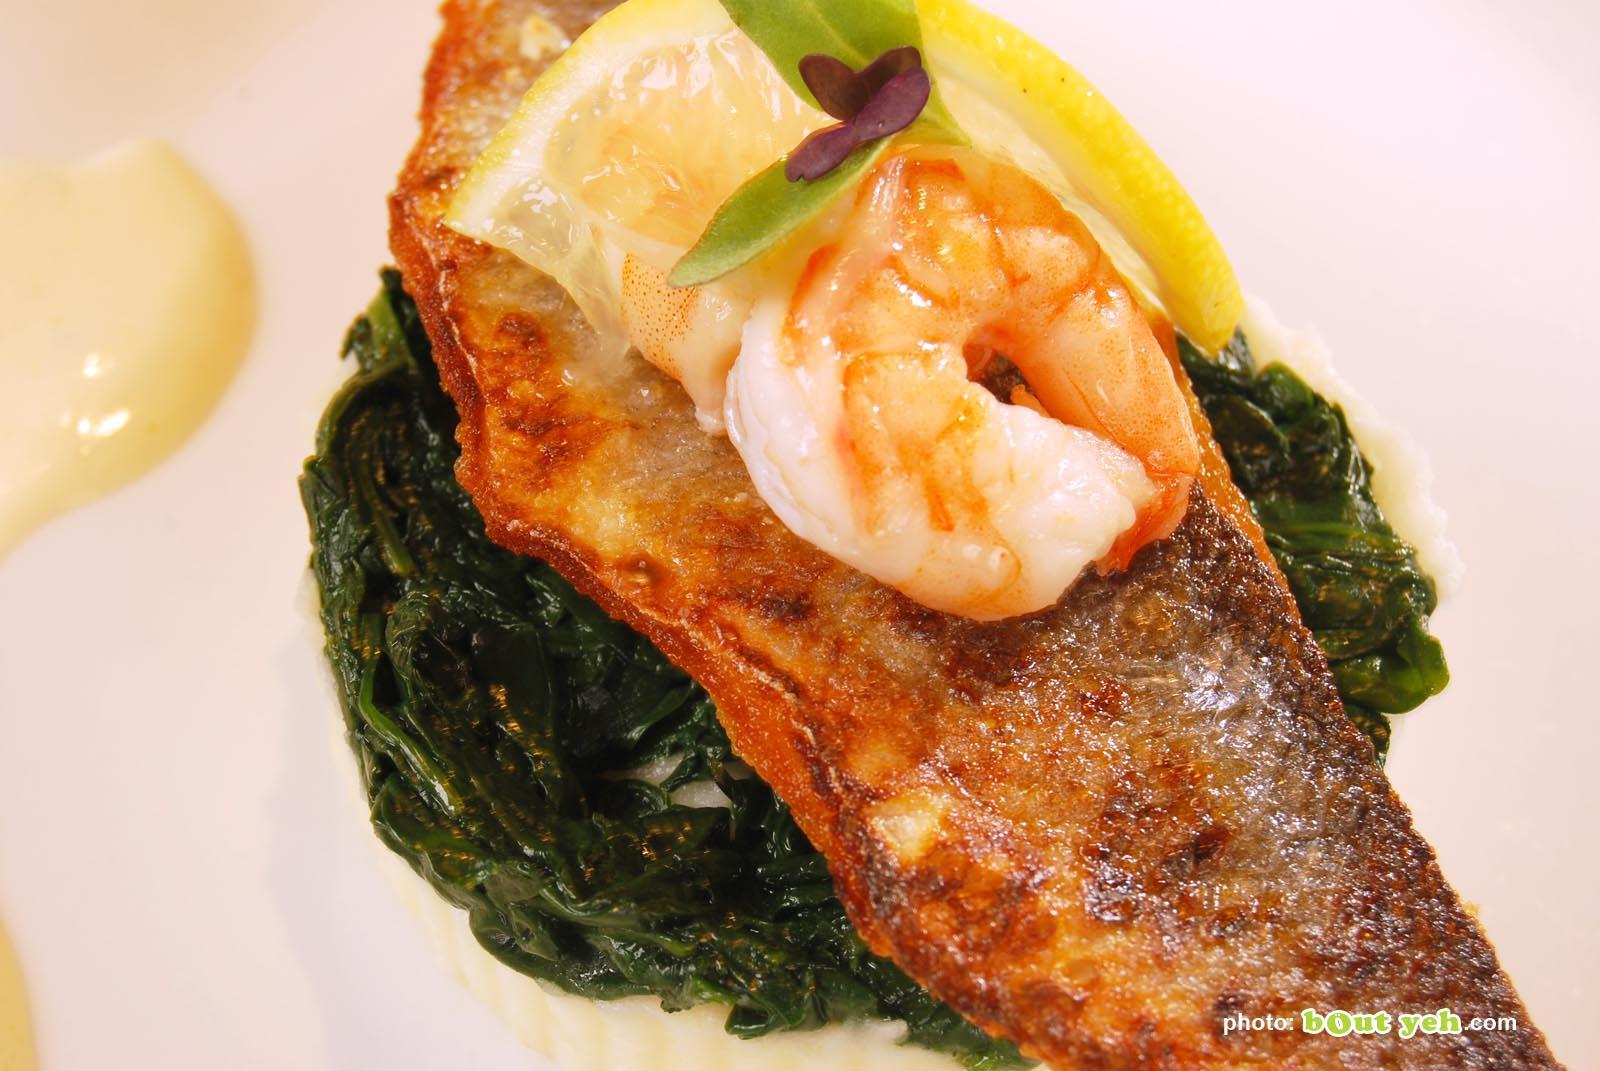 Food photographers Belfast portfolio photo 0854 - fish dish with prawn and lemon garnish